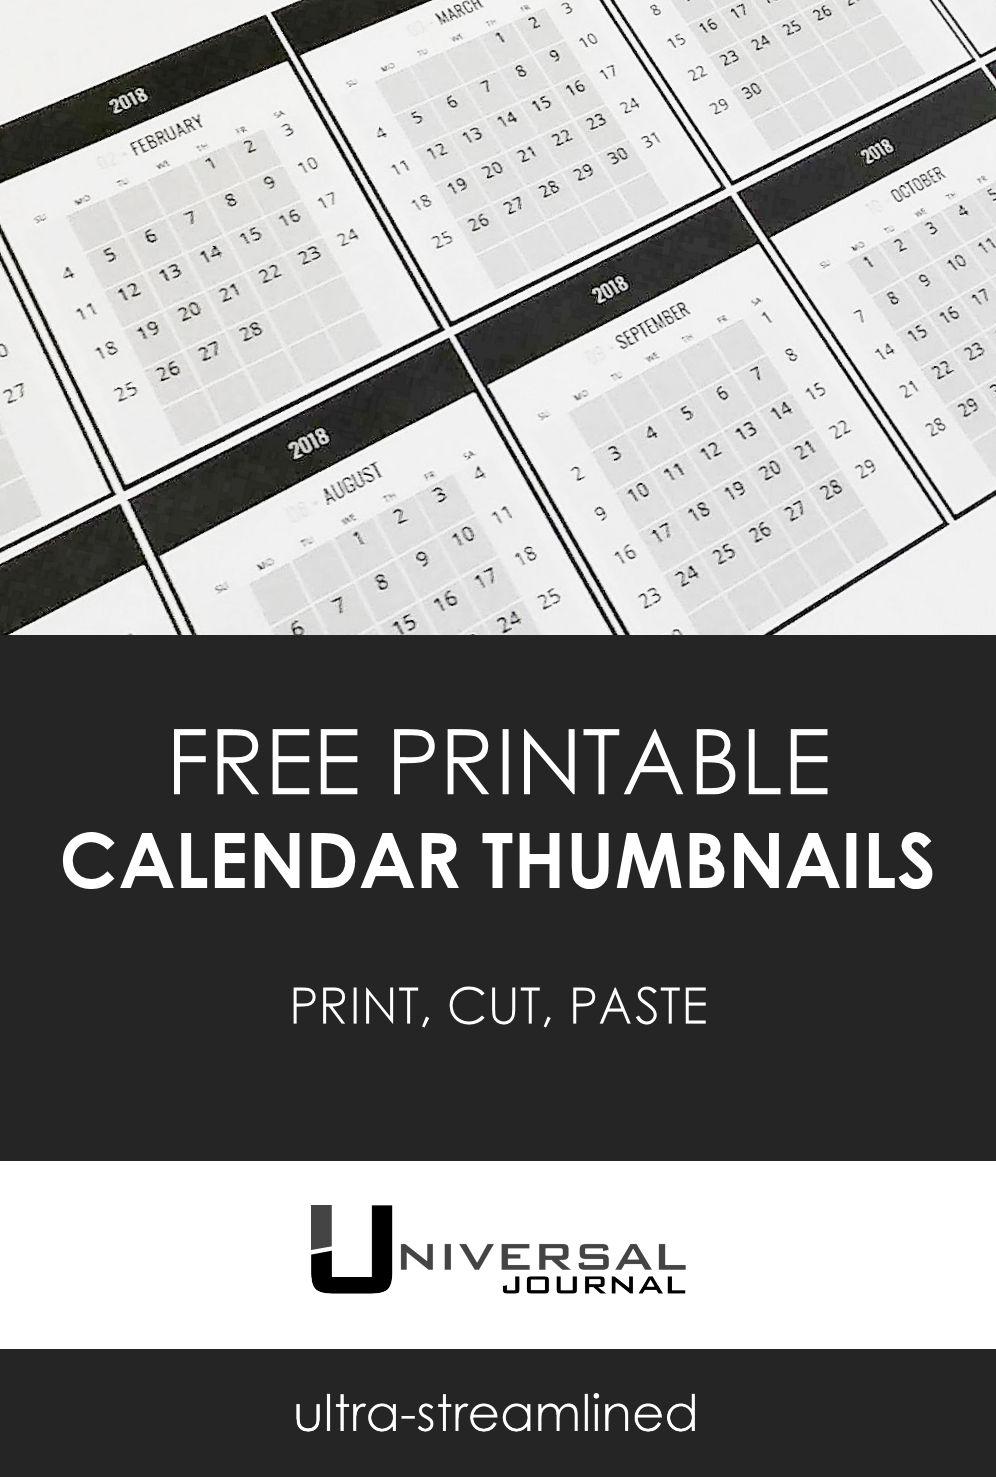 free calendar thumbnail printouts for bullet journal